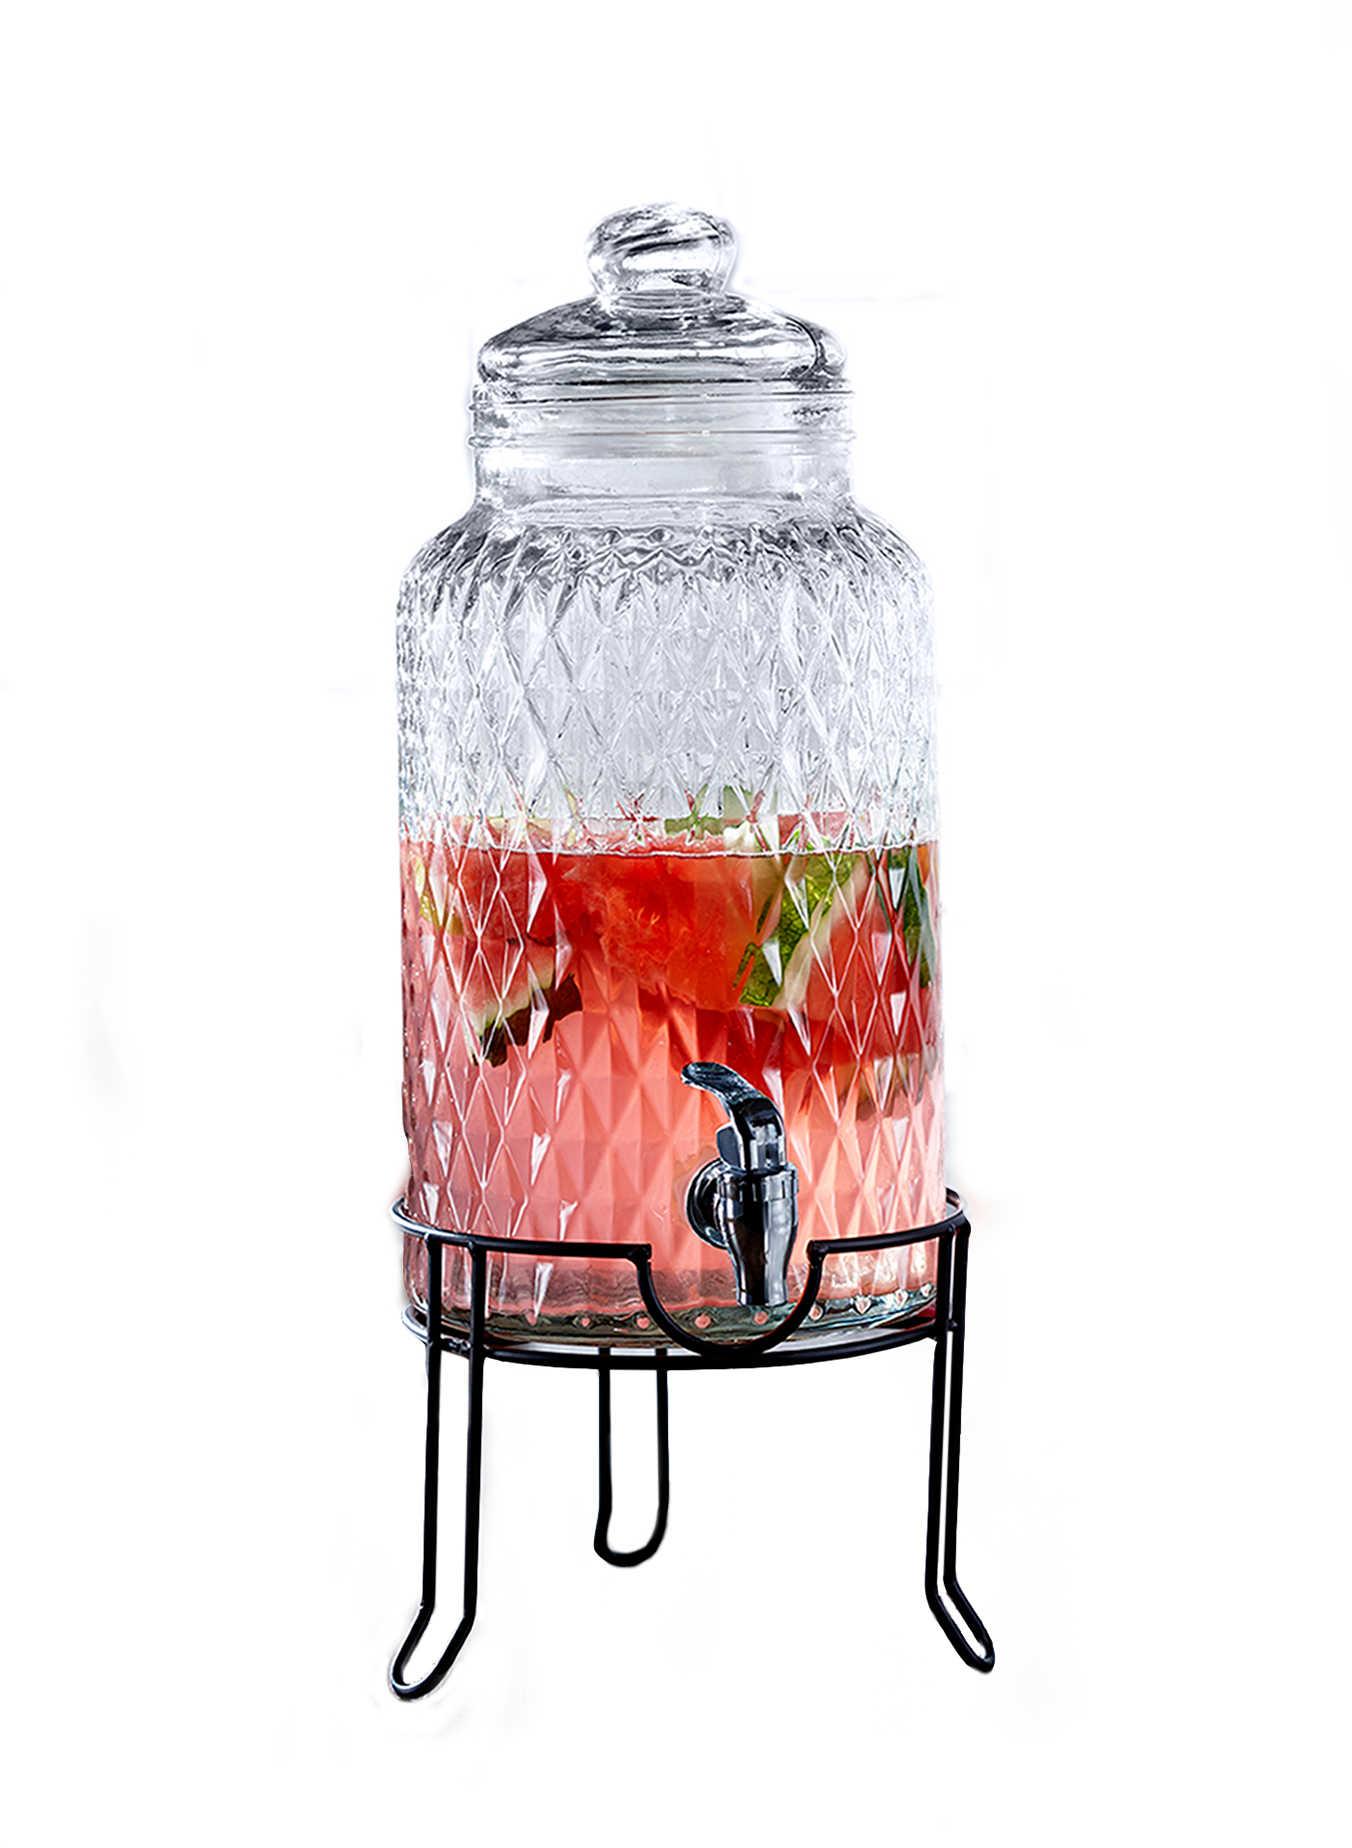 Glass Beverage Dispenser - BedBathandBeyond.com